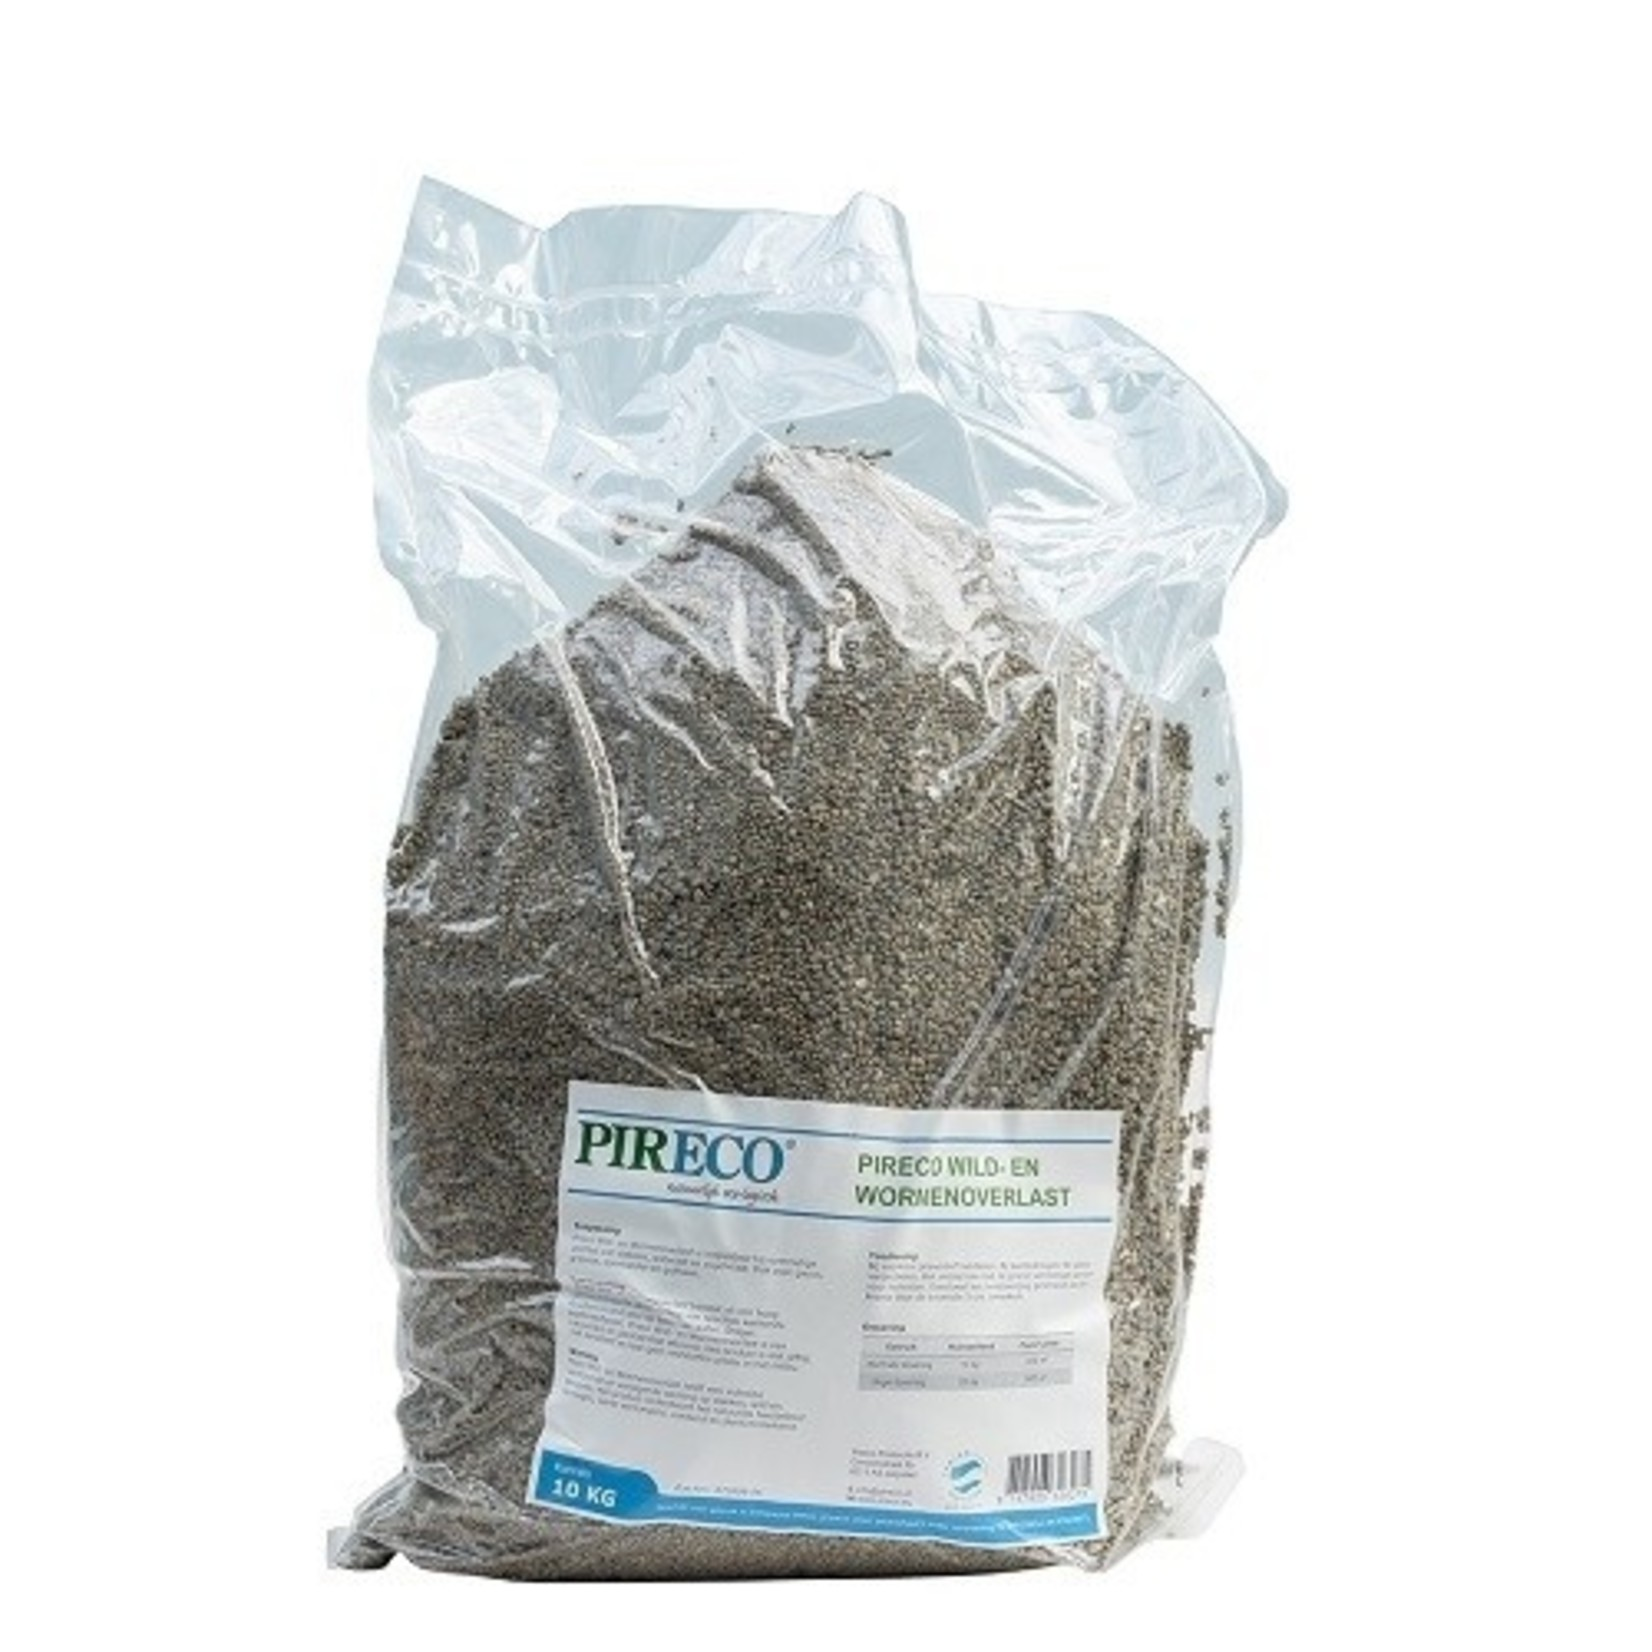 Pireco Delumbri Wormen- en wildoverlast korrels 10 kg